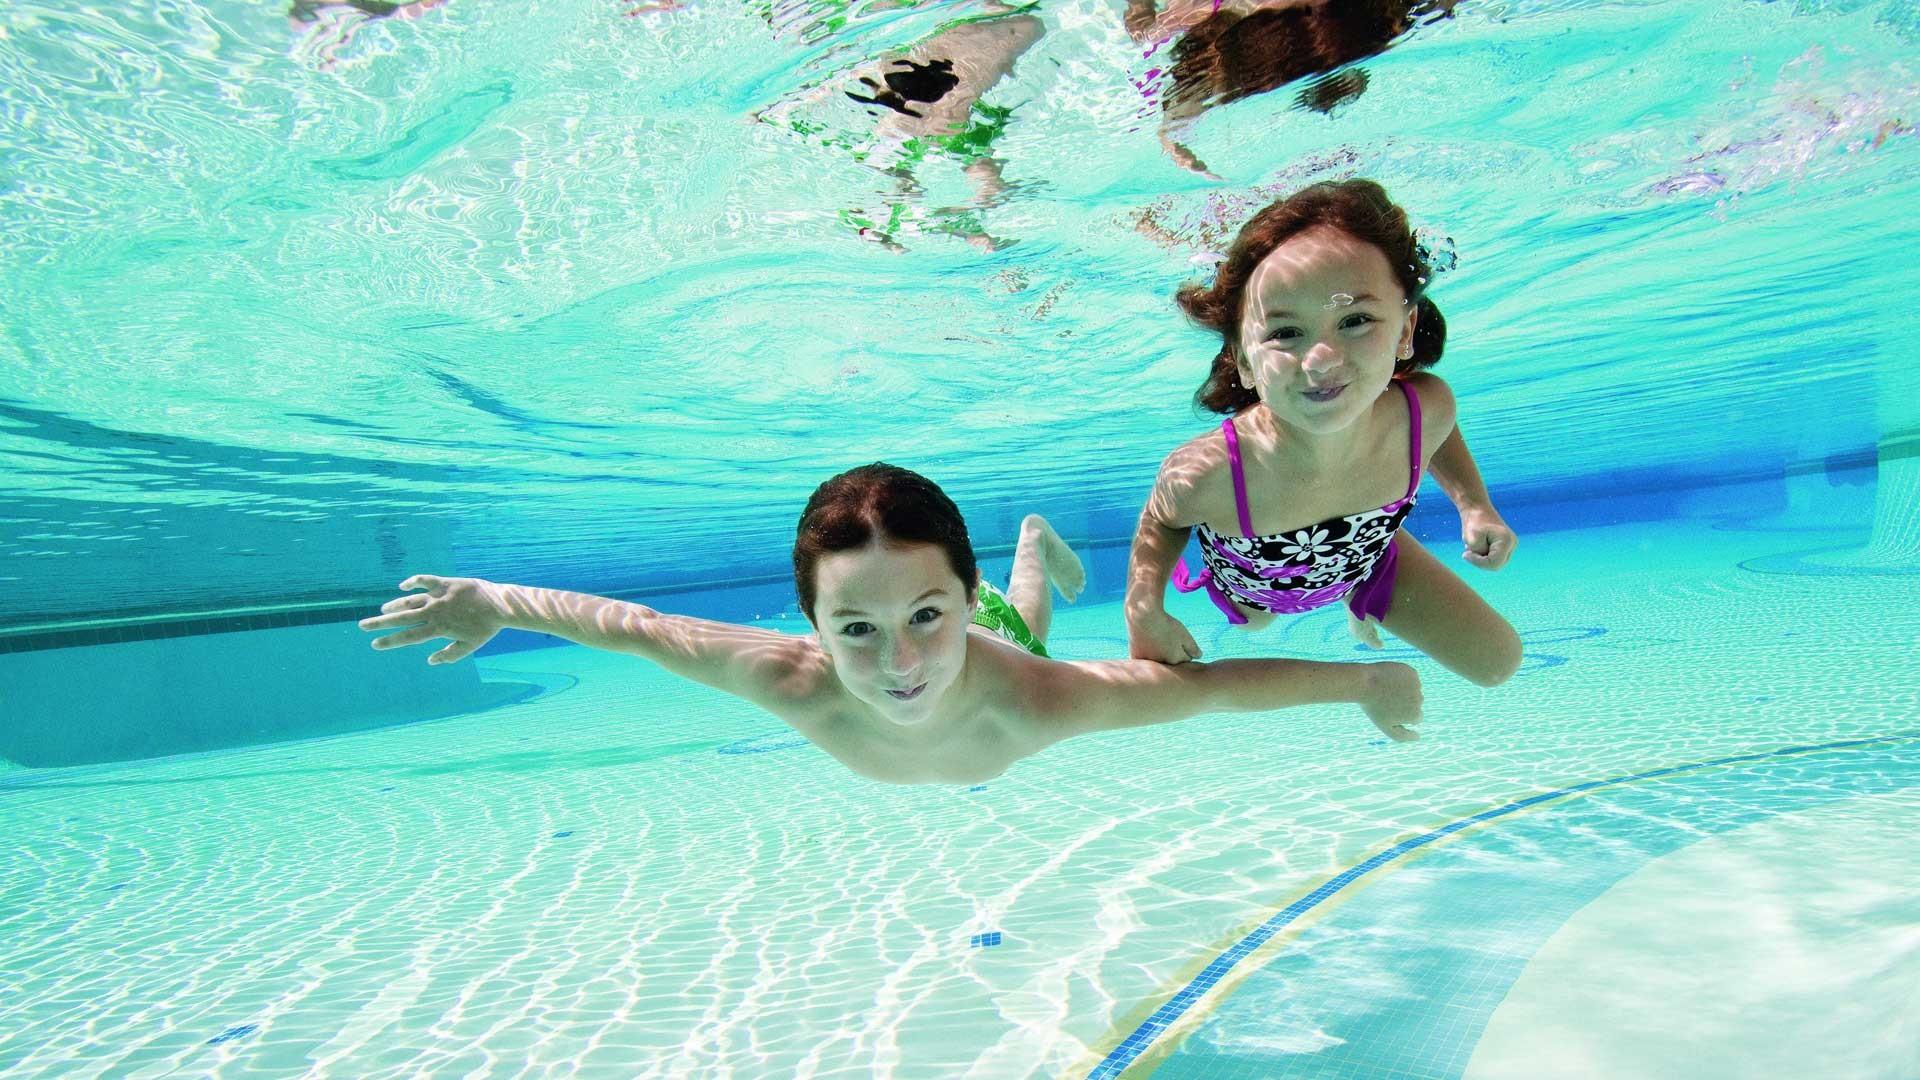 Kids in Swimming Pool Wallpaper